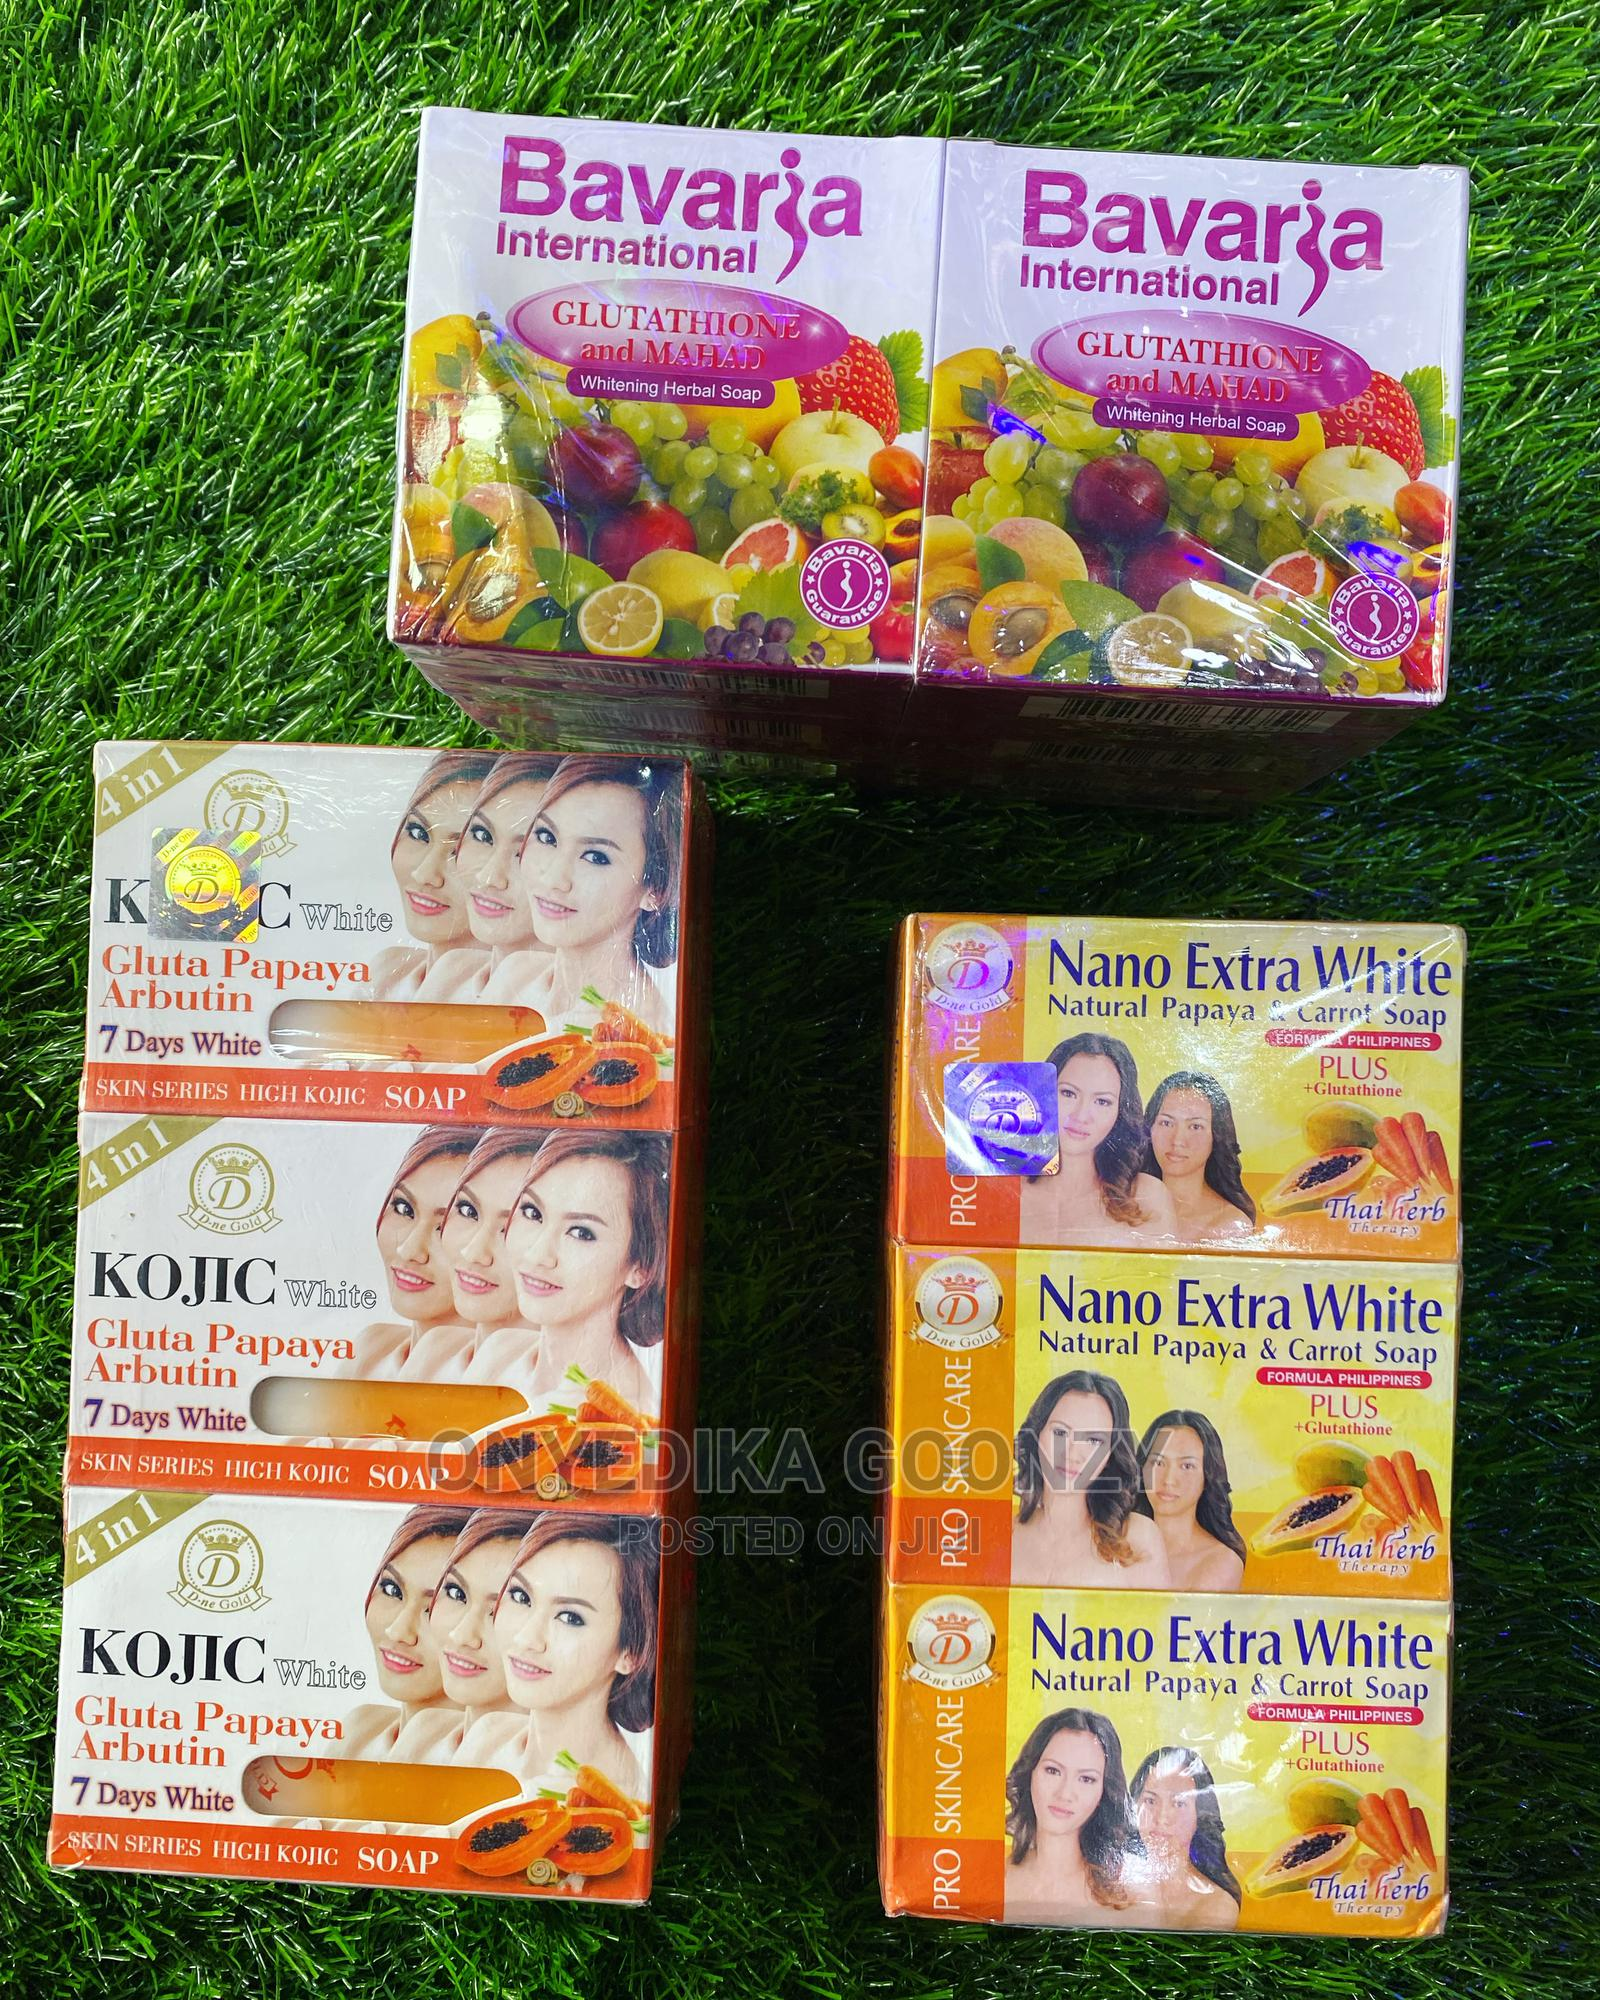 Bavaria Soap, Nano Extra White , Kojic Gluta Papaya Soap